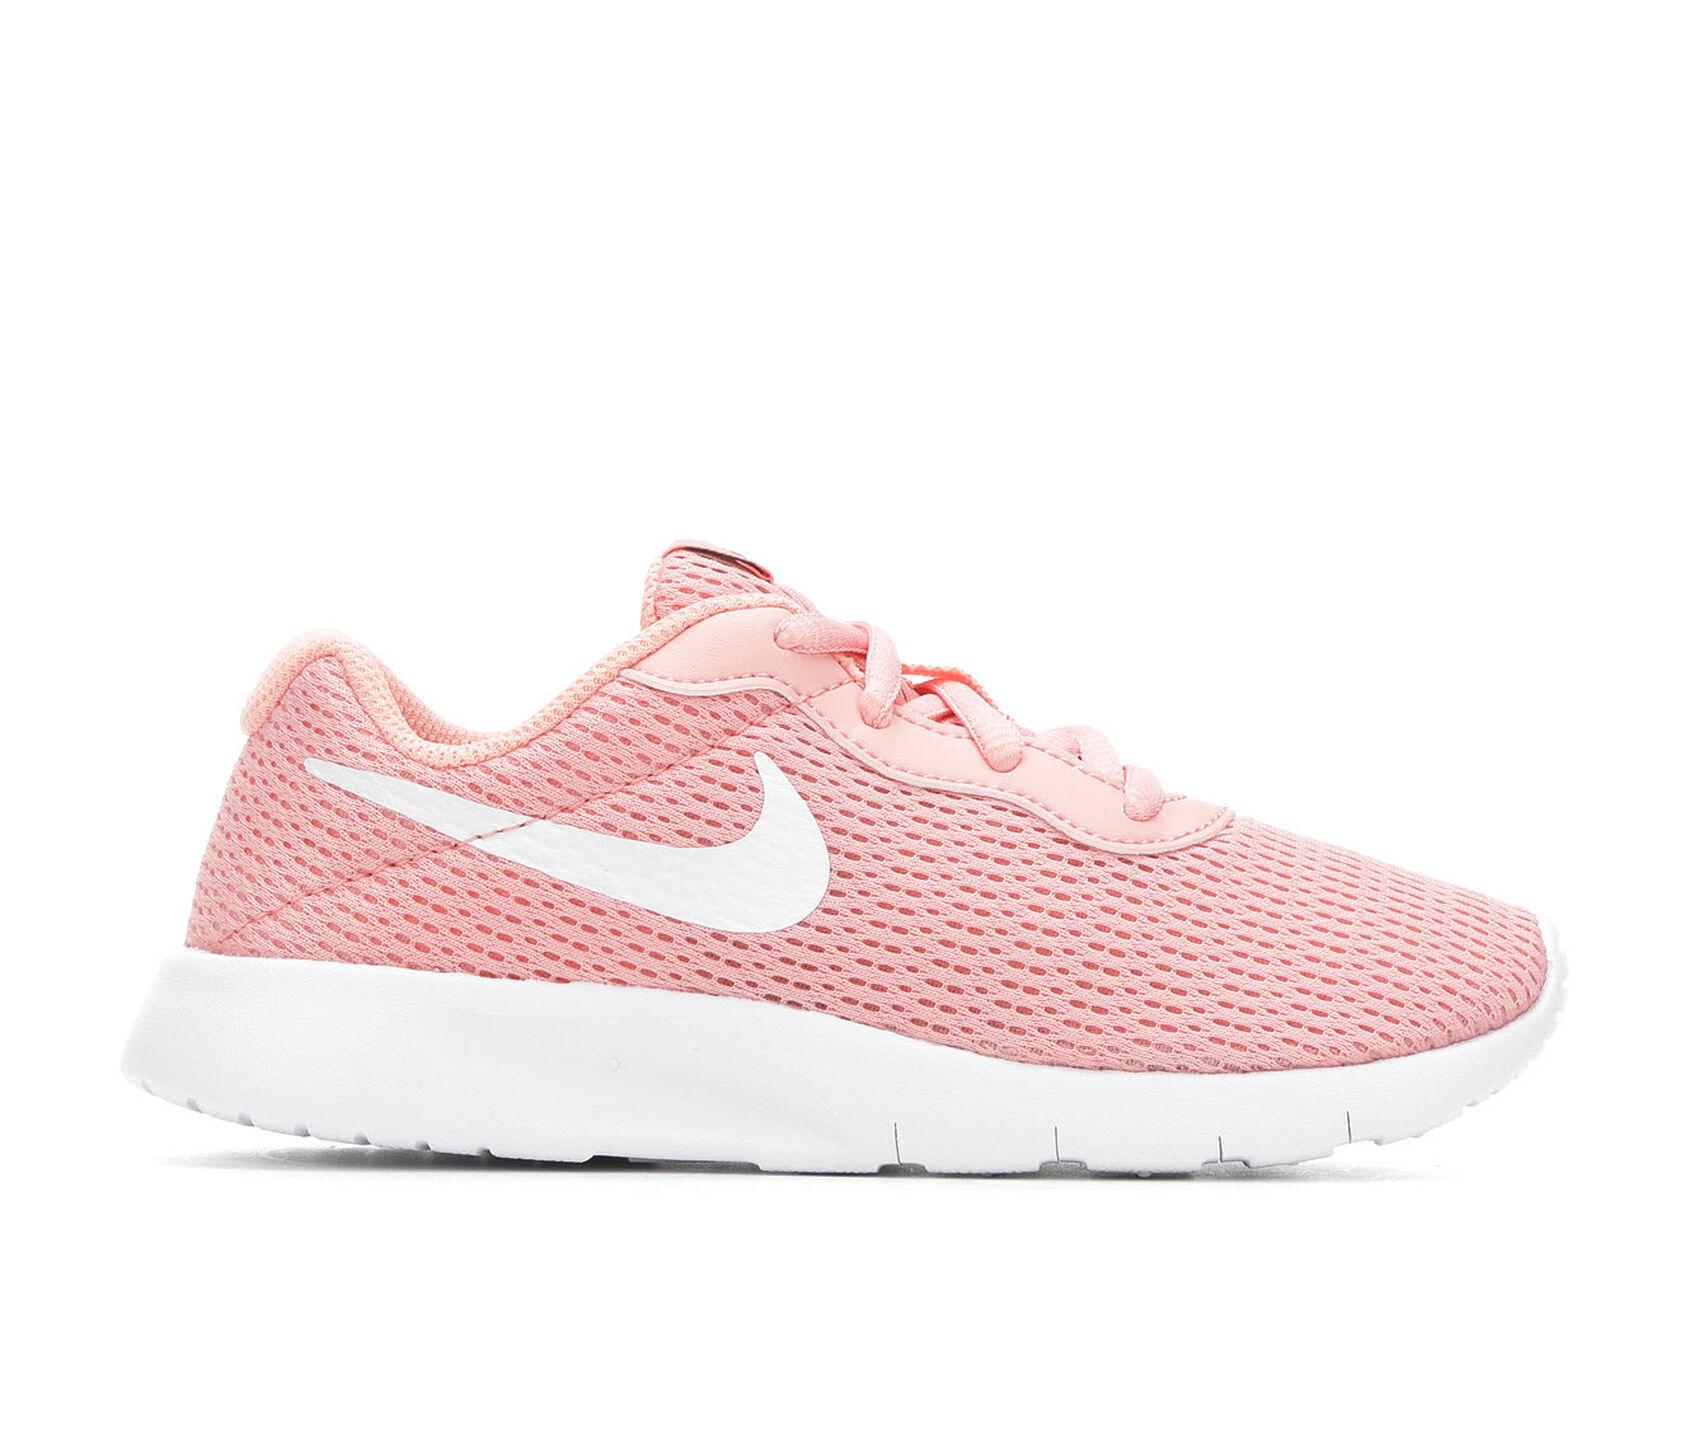 0de180502eb796 ... Nike Little Kid Tanjun Sneakers. Previous